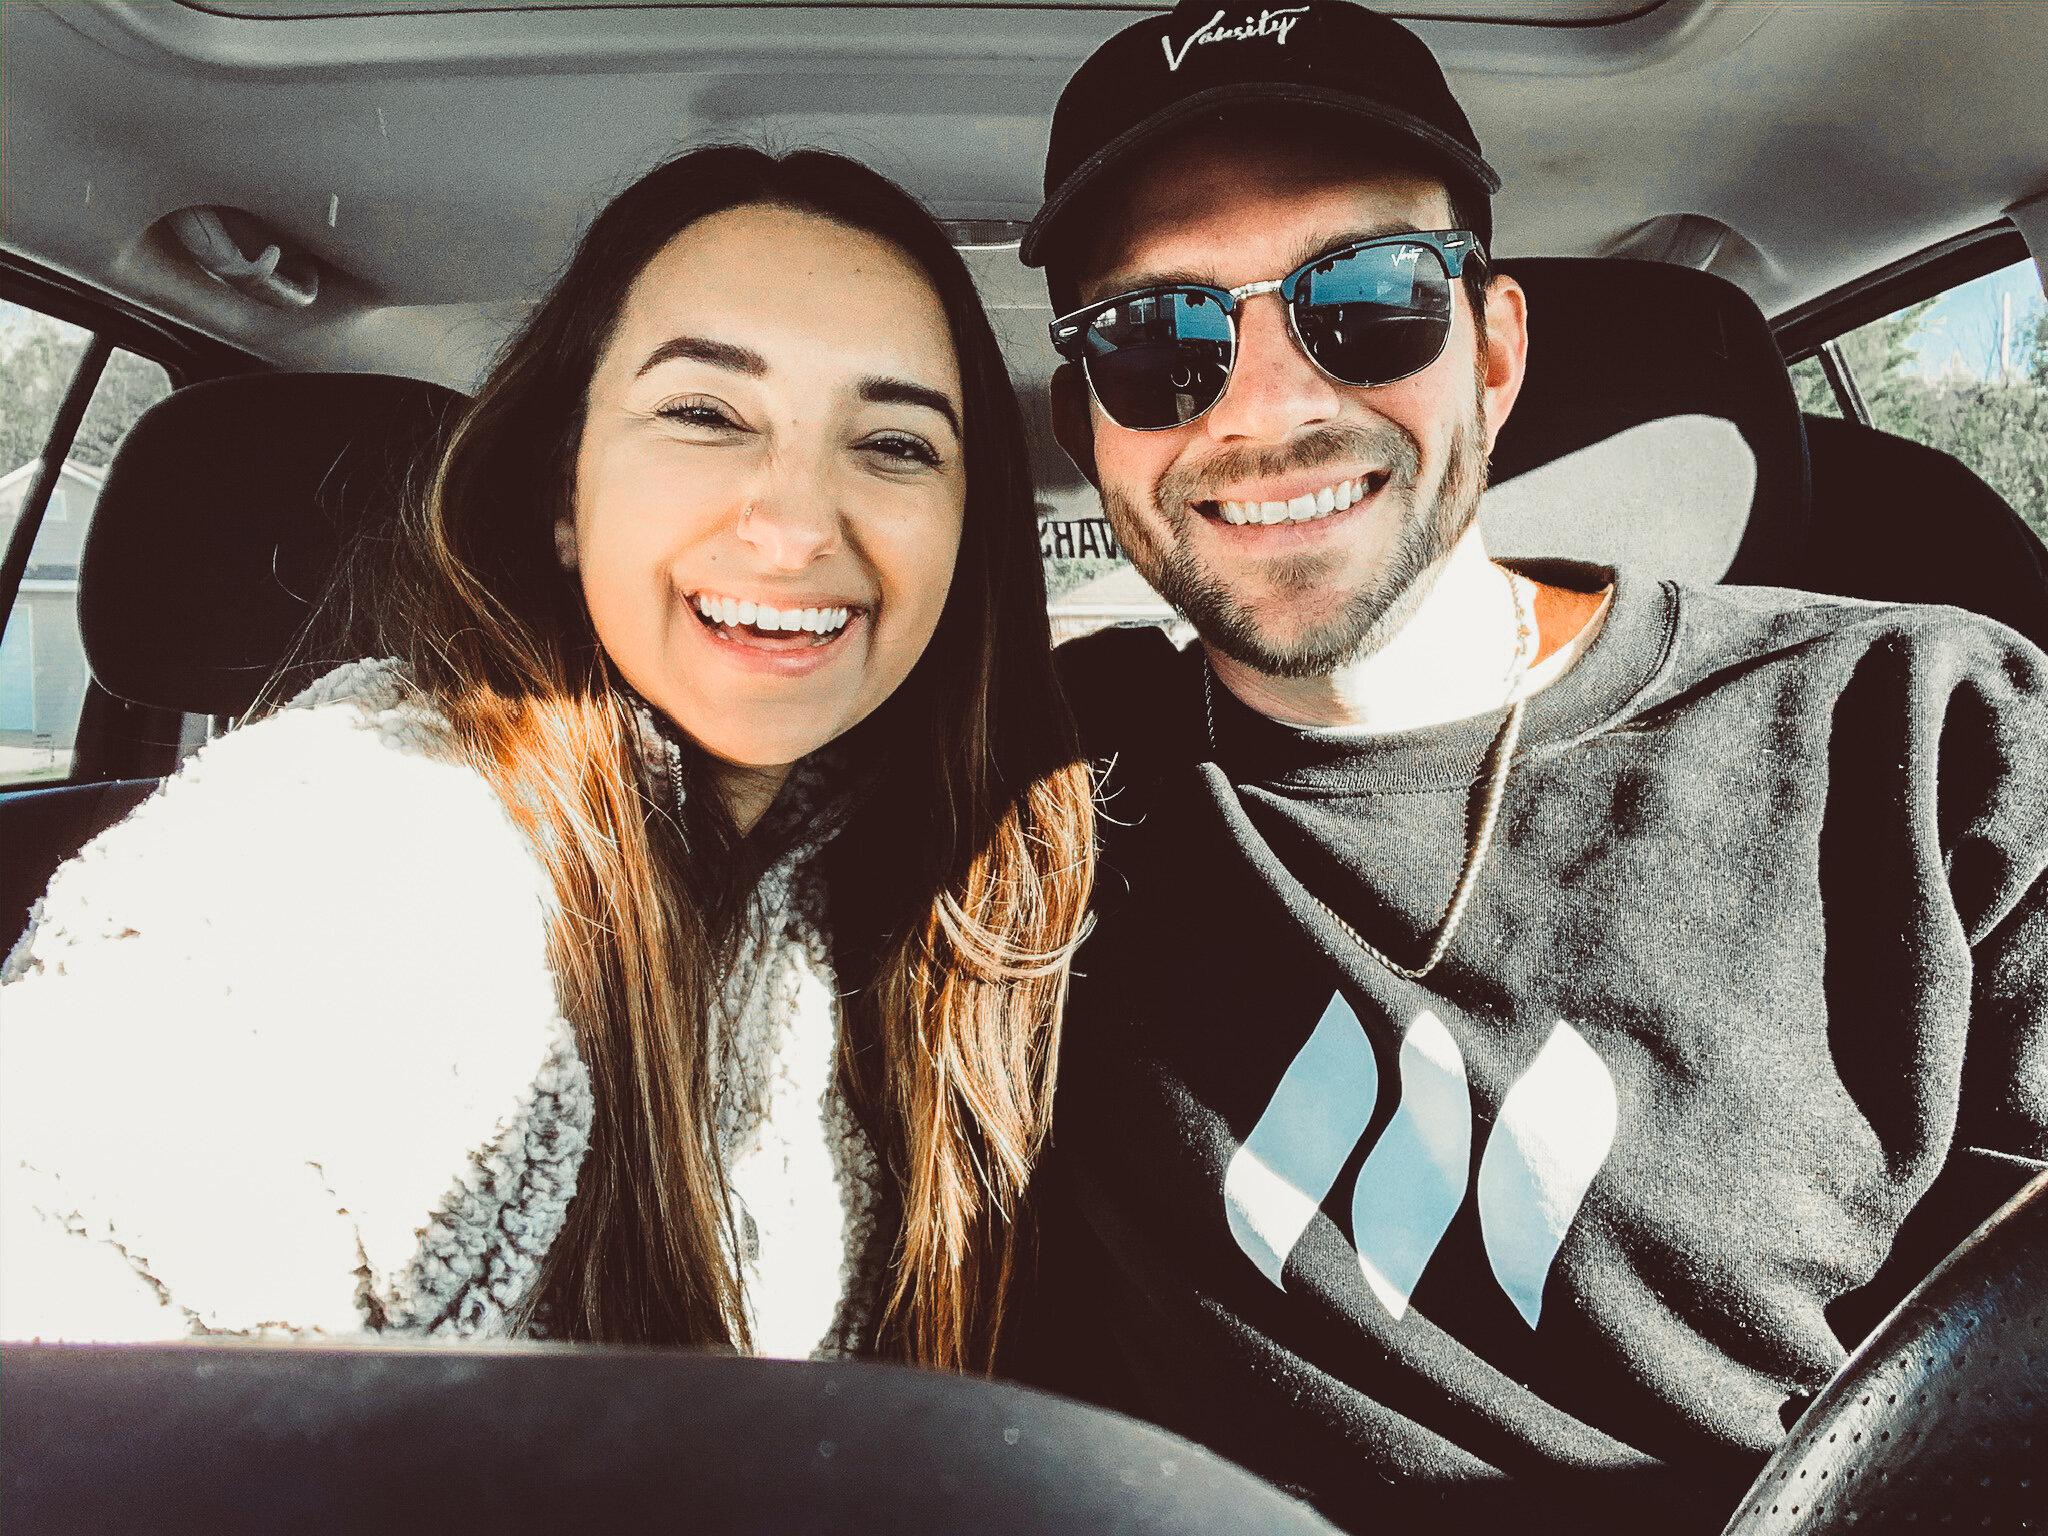 Founder Dylan and his fiance Olivia headed 8 hours from Kansas City to Nashville,   LET'S GOOOOO  !